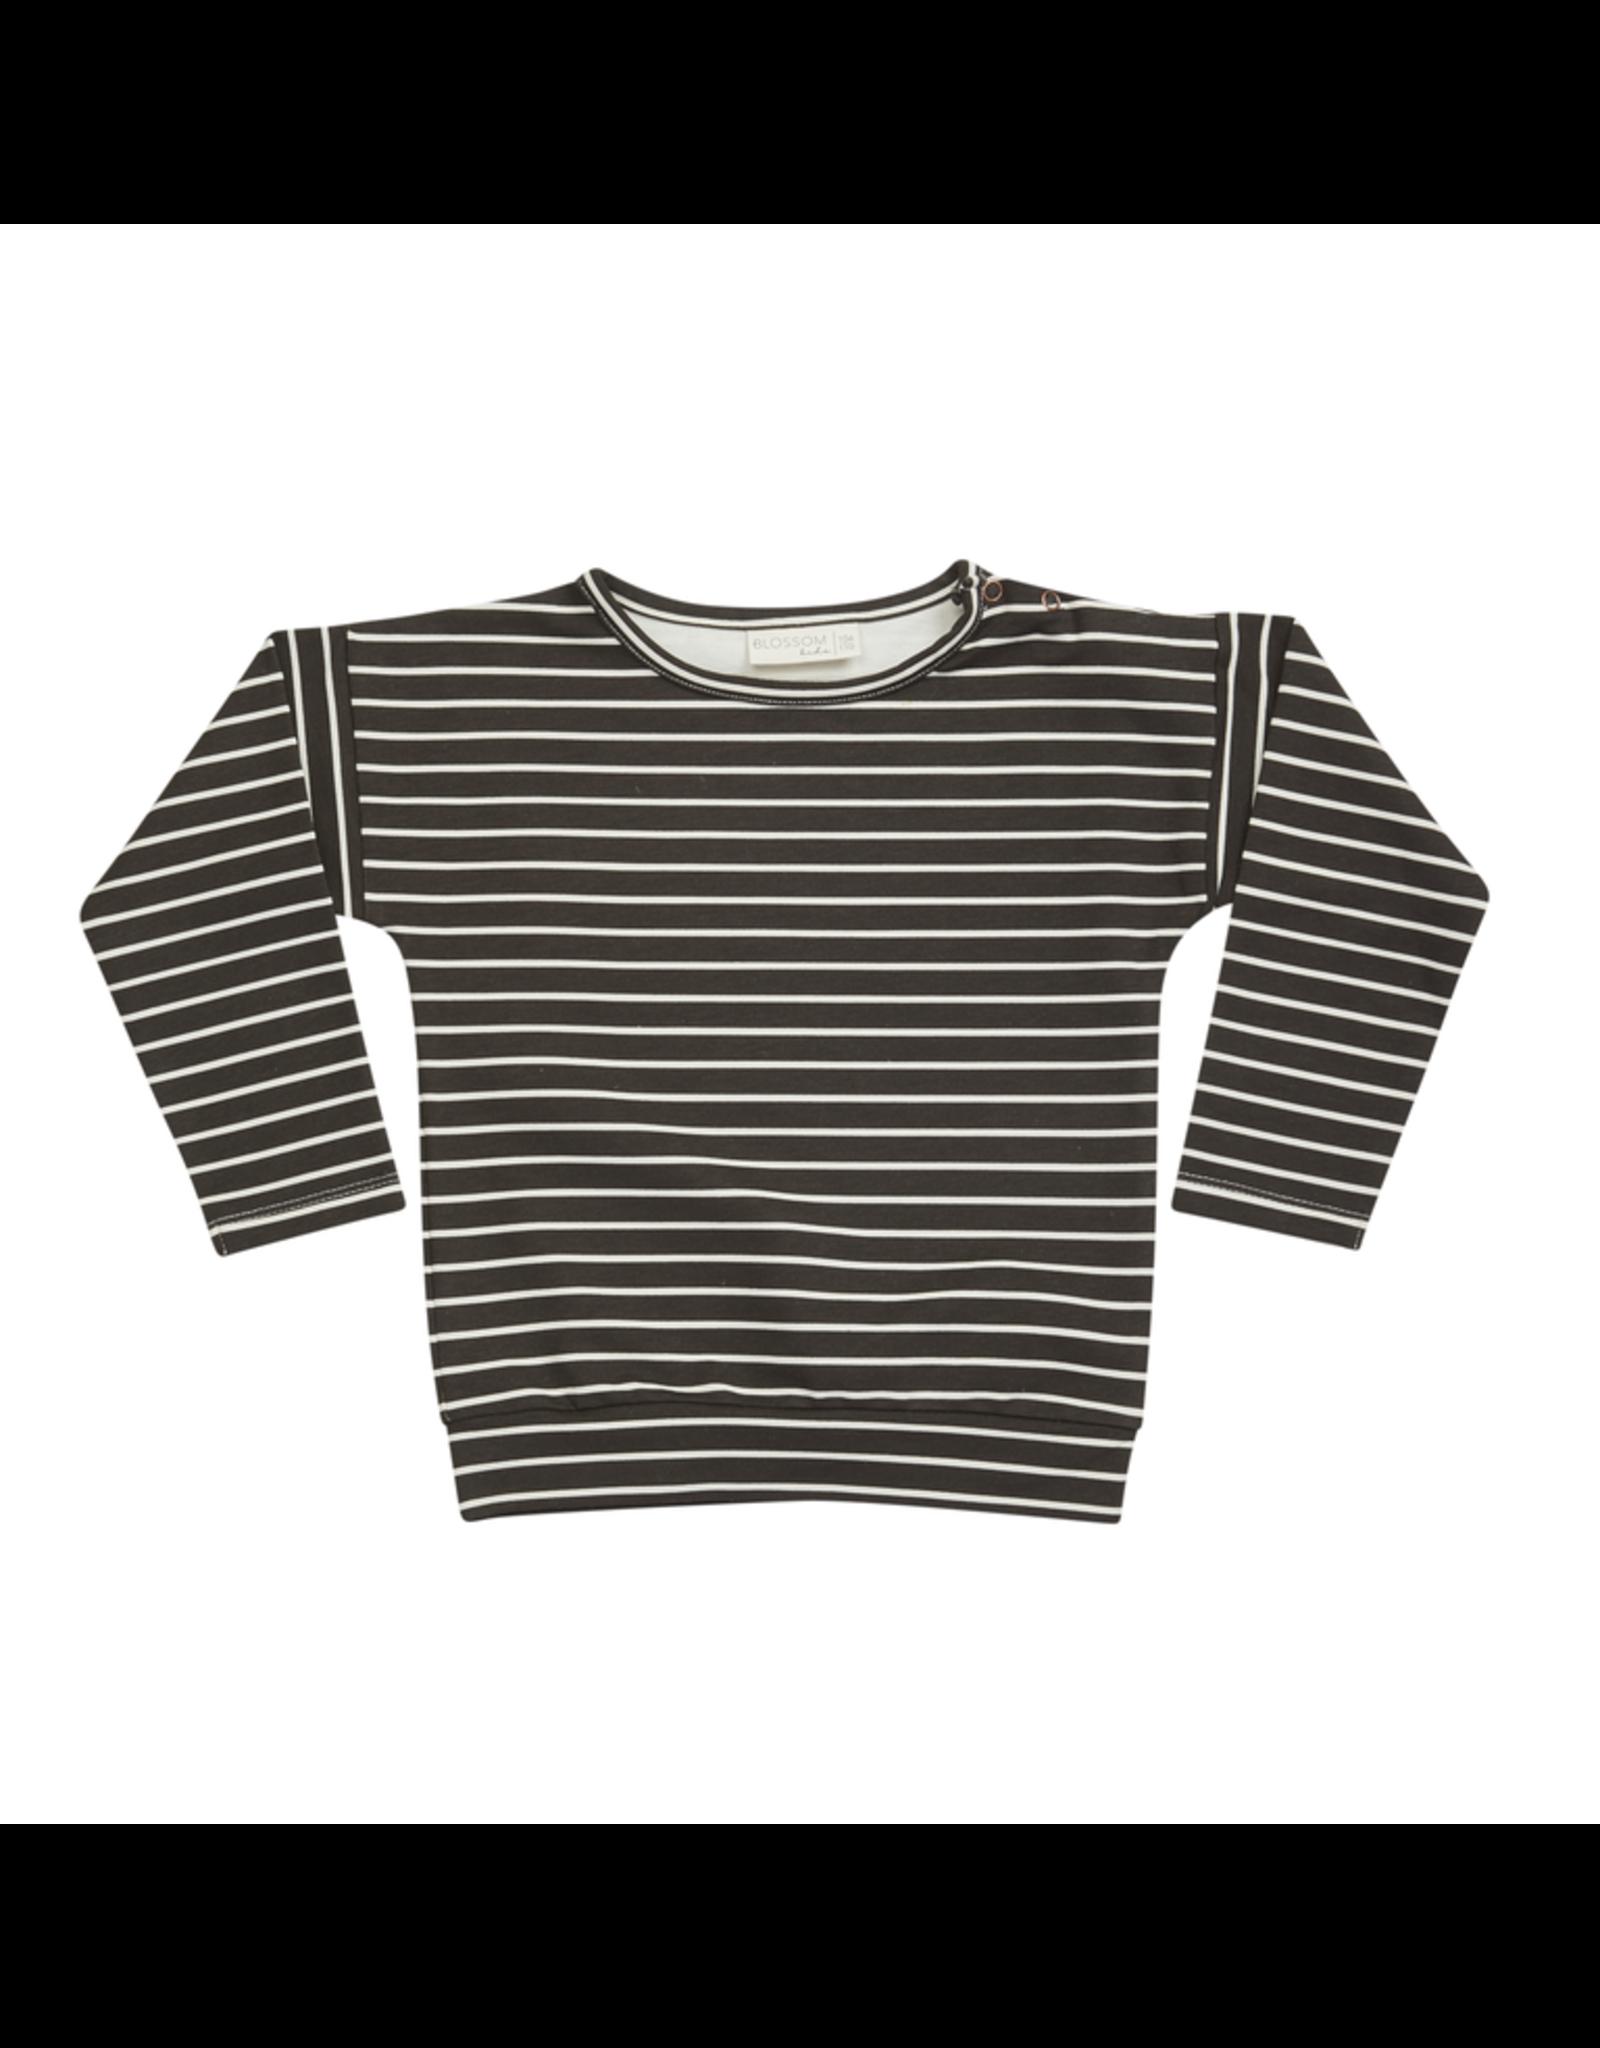 Blossom Kids Long sleeve, Petit Stripes, Espresso Black